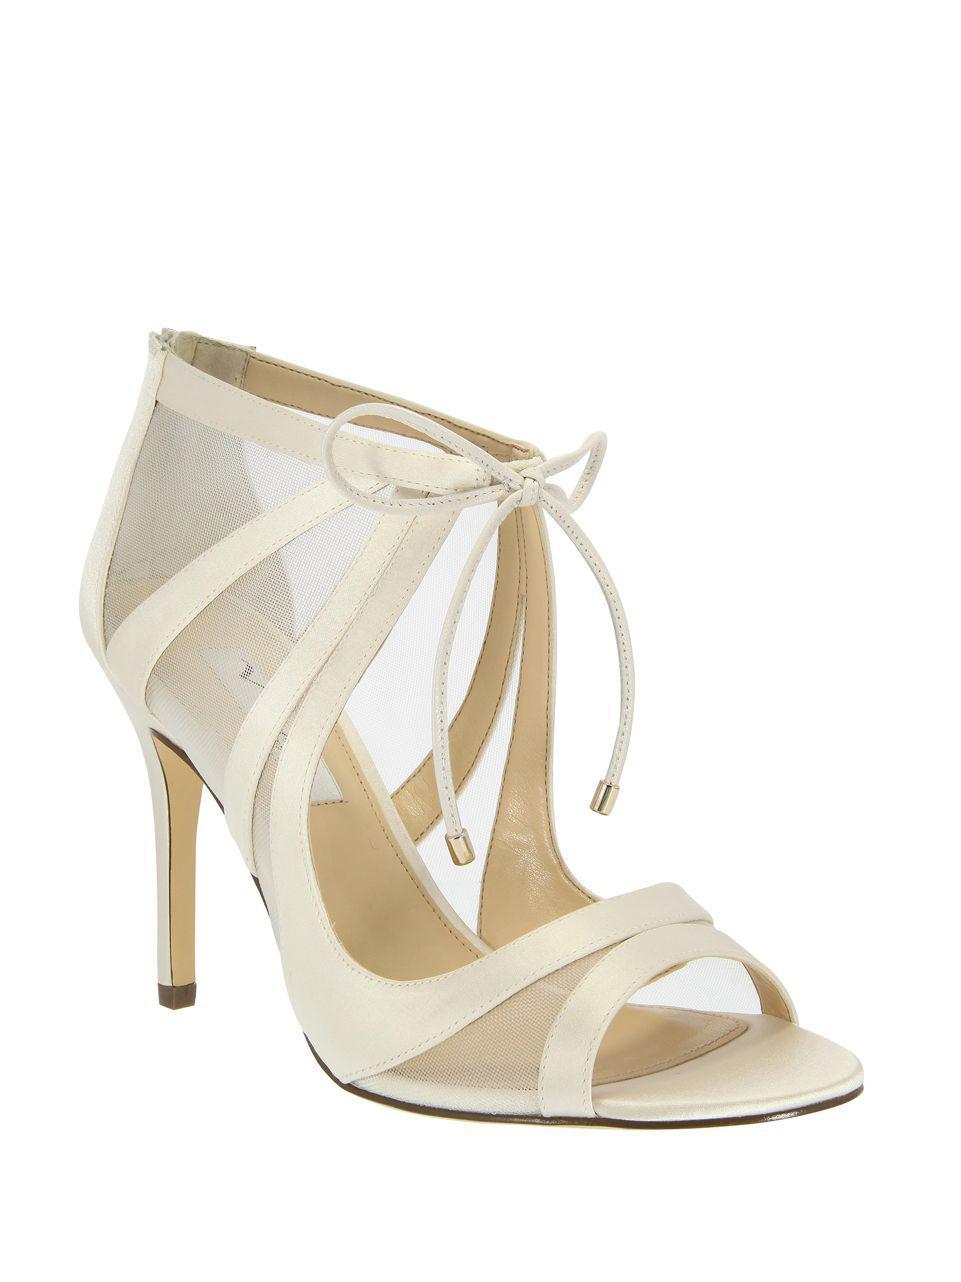 ae3e790befb2 Nina Cherie Satin Stiletto Sandals in White - Lyst